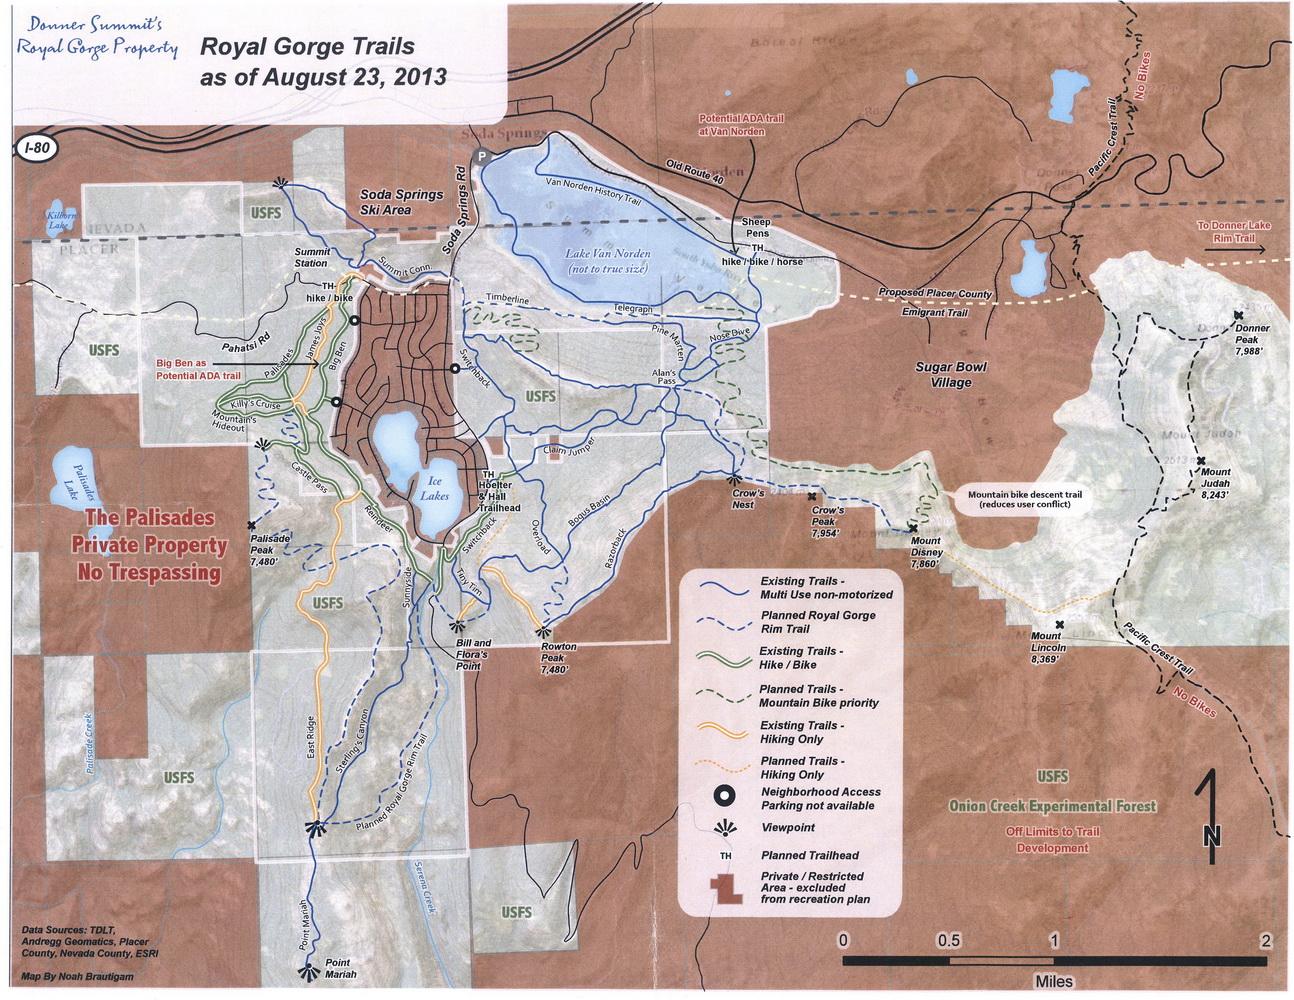 DTLT-RG Trails 8-23-13